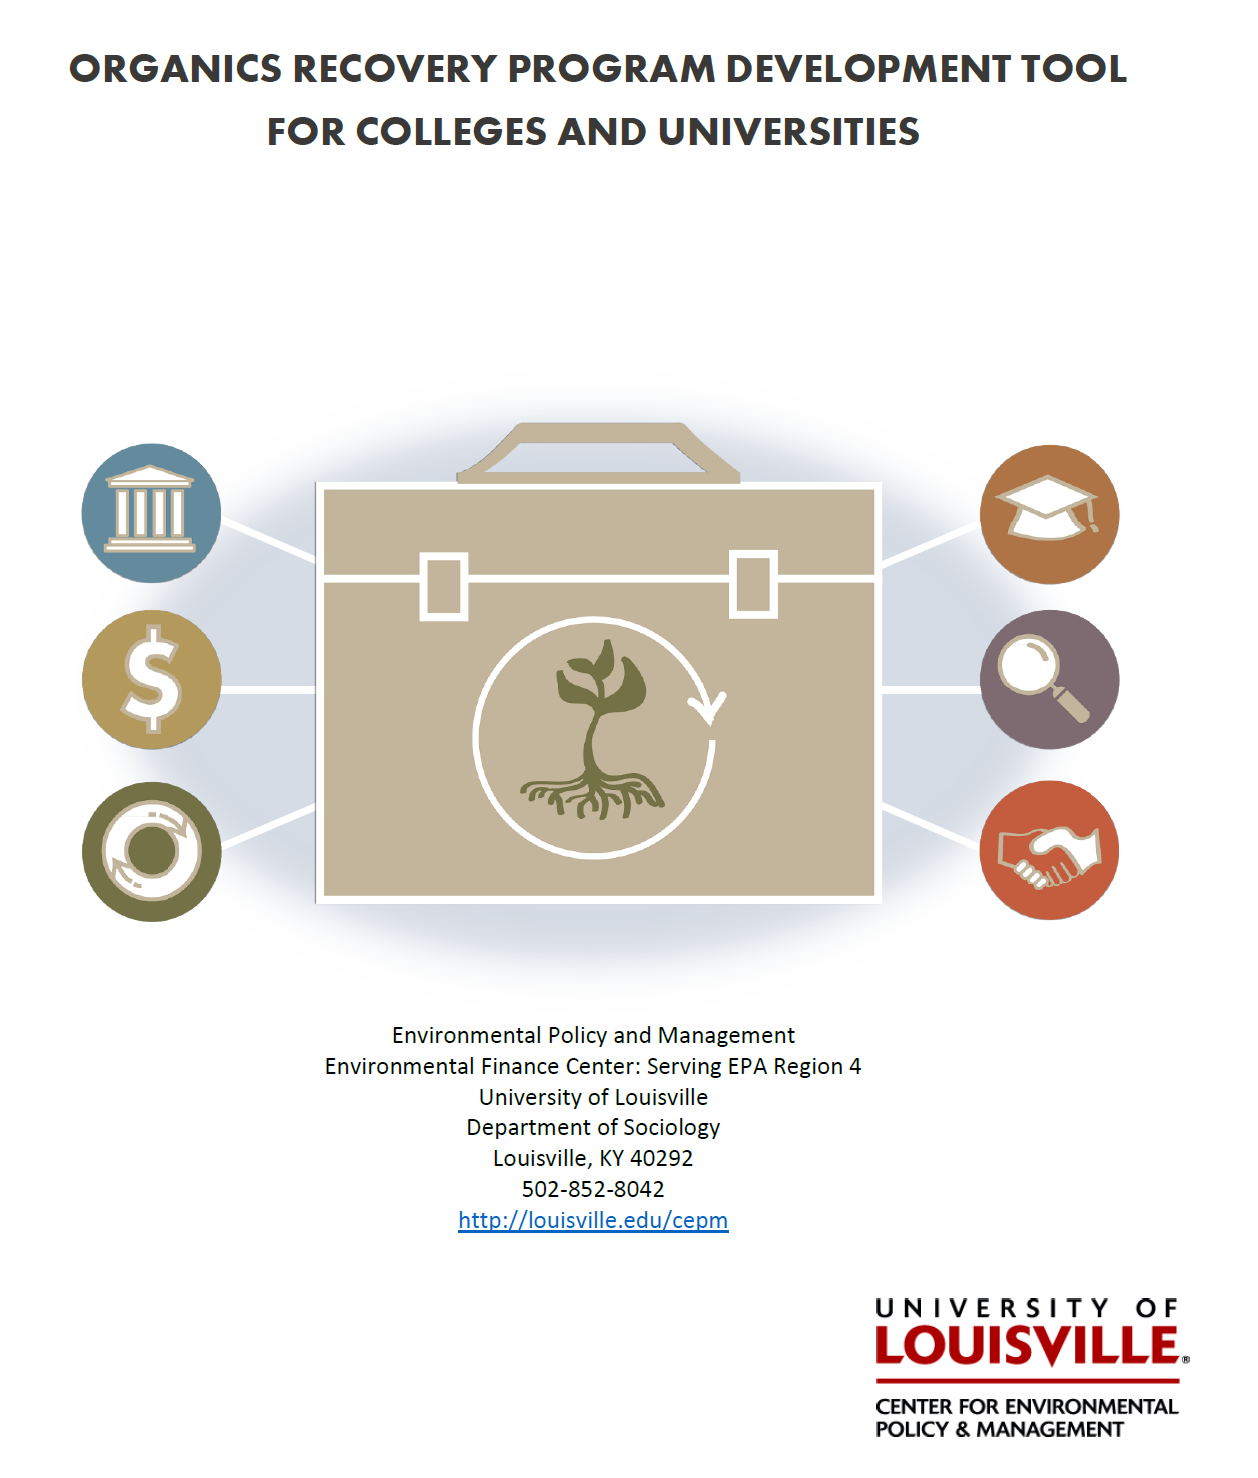 louisville-organics-tool-kit